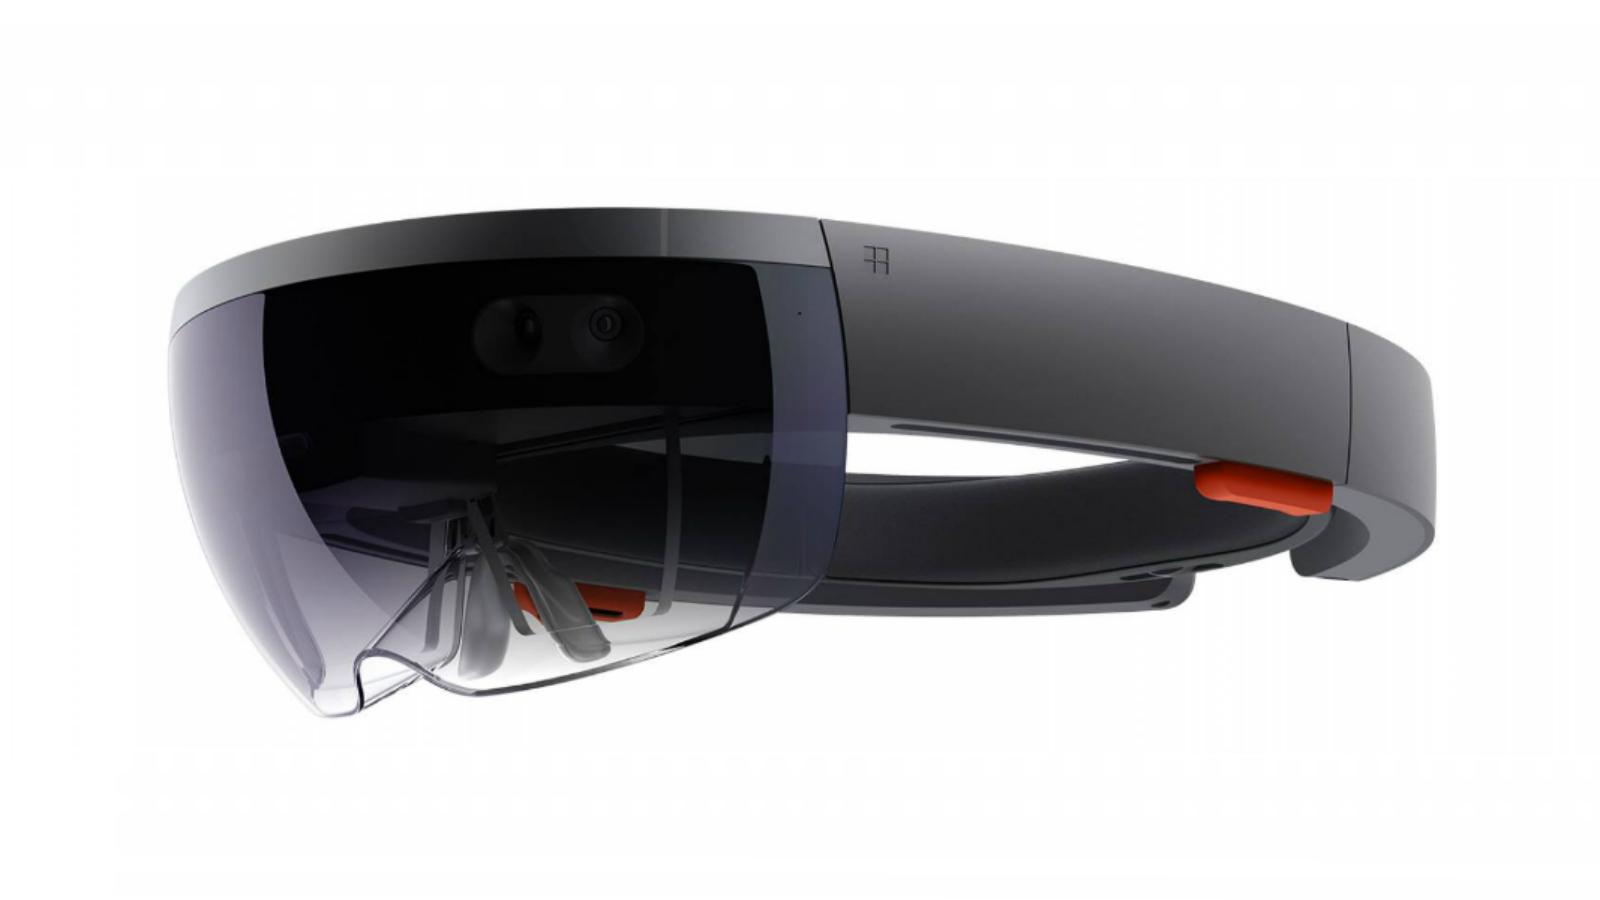 Hololens - Microsoft AR devices